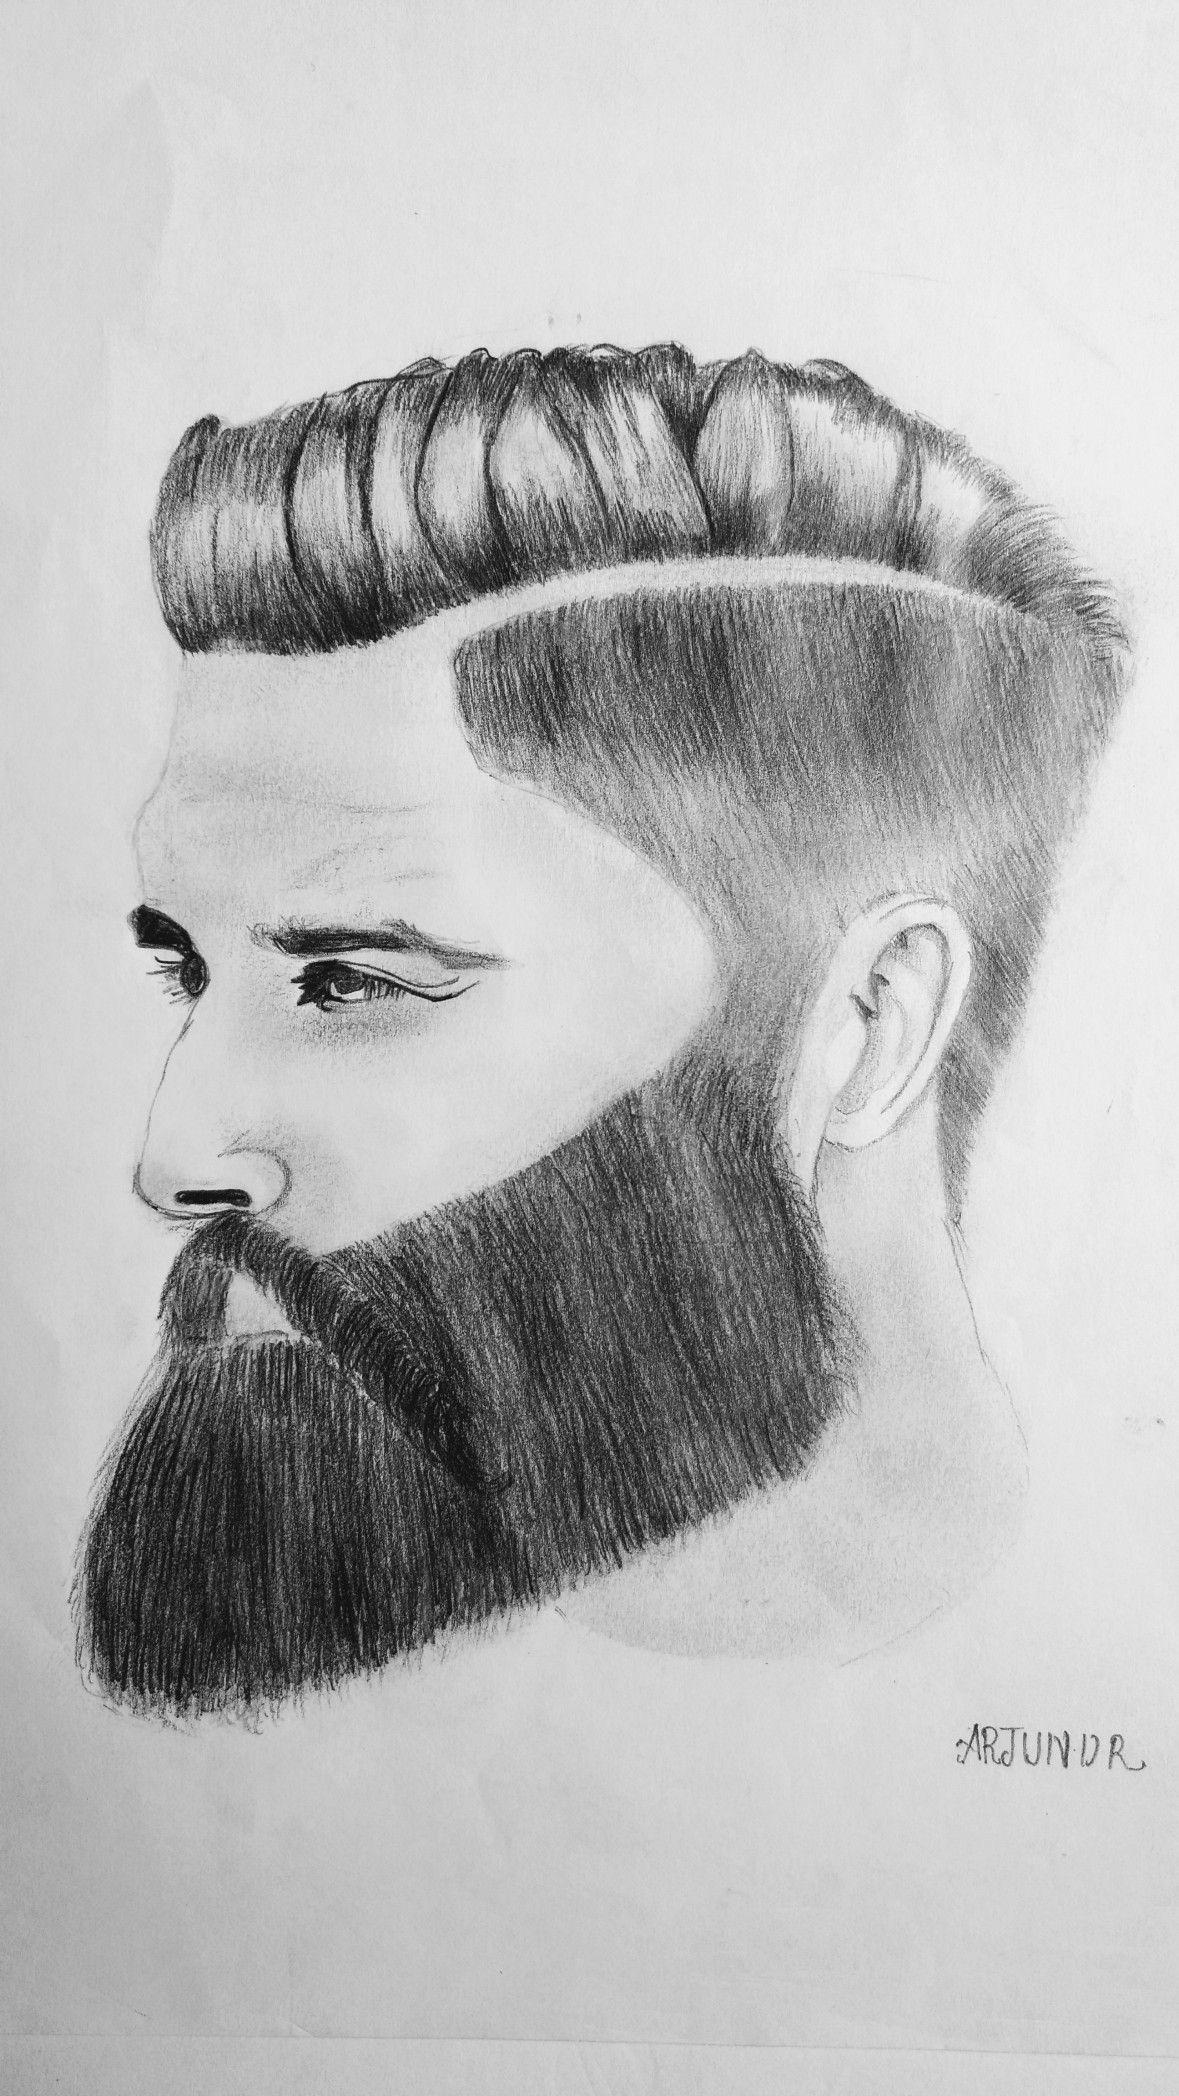 Man with beard pencil drawing